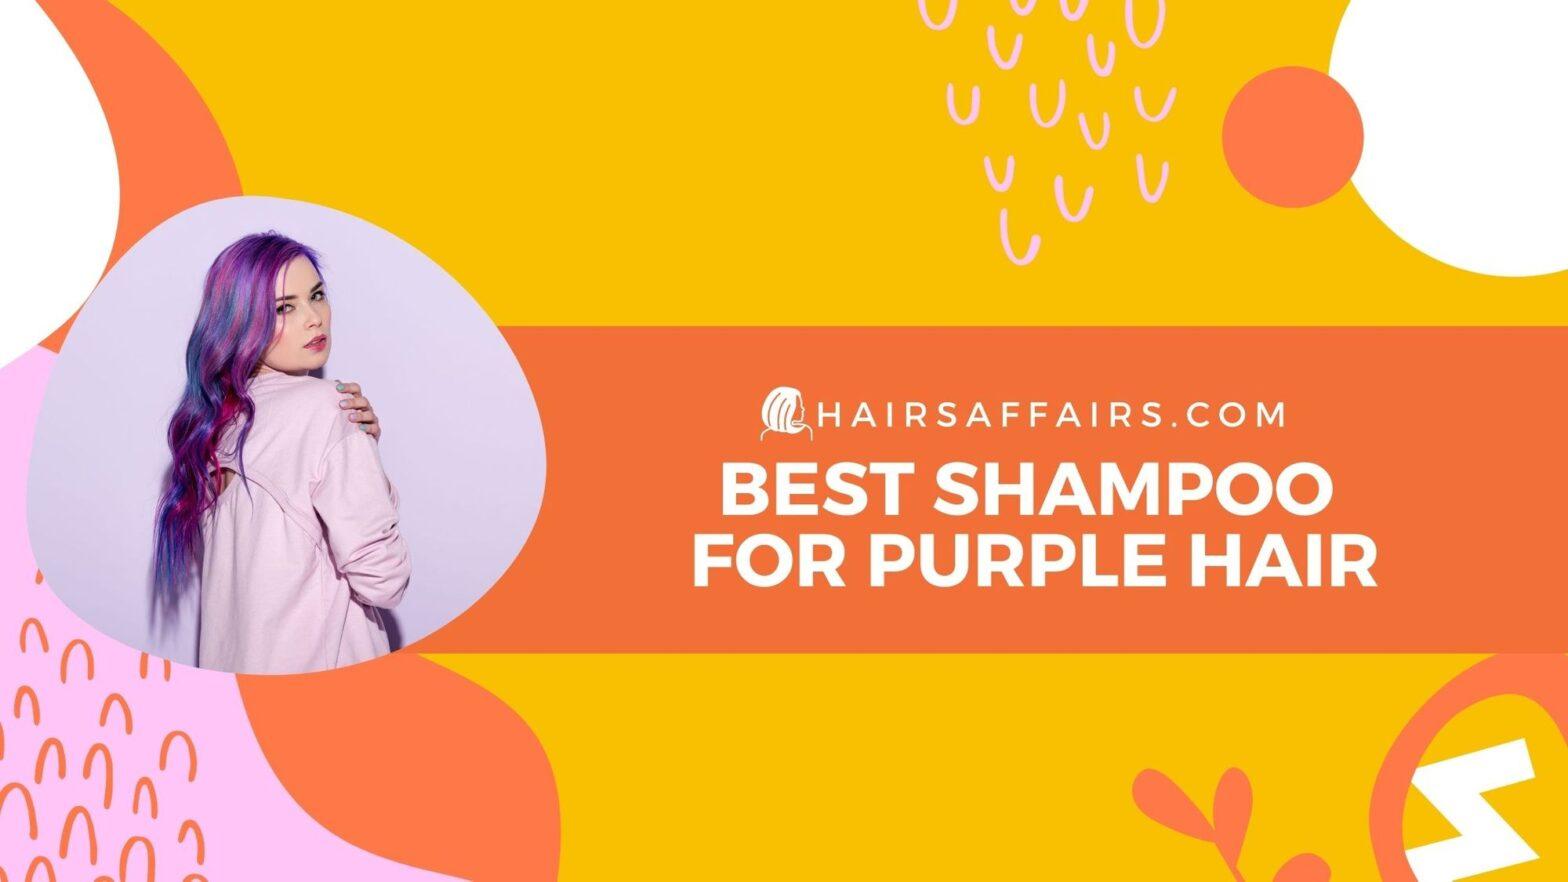 HA-Best-shampoo-for-purple-hair